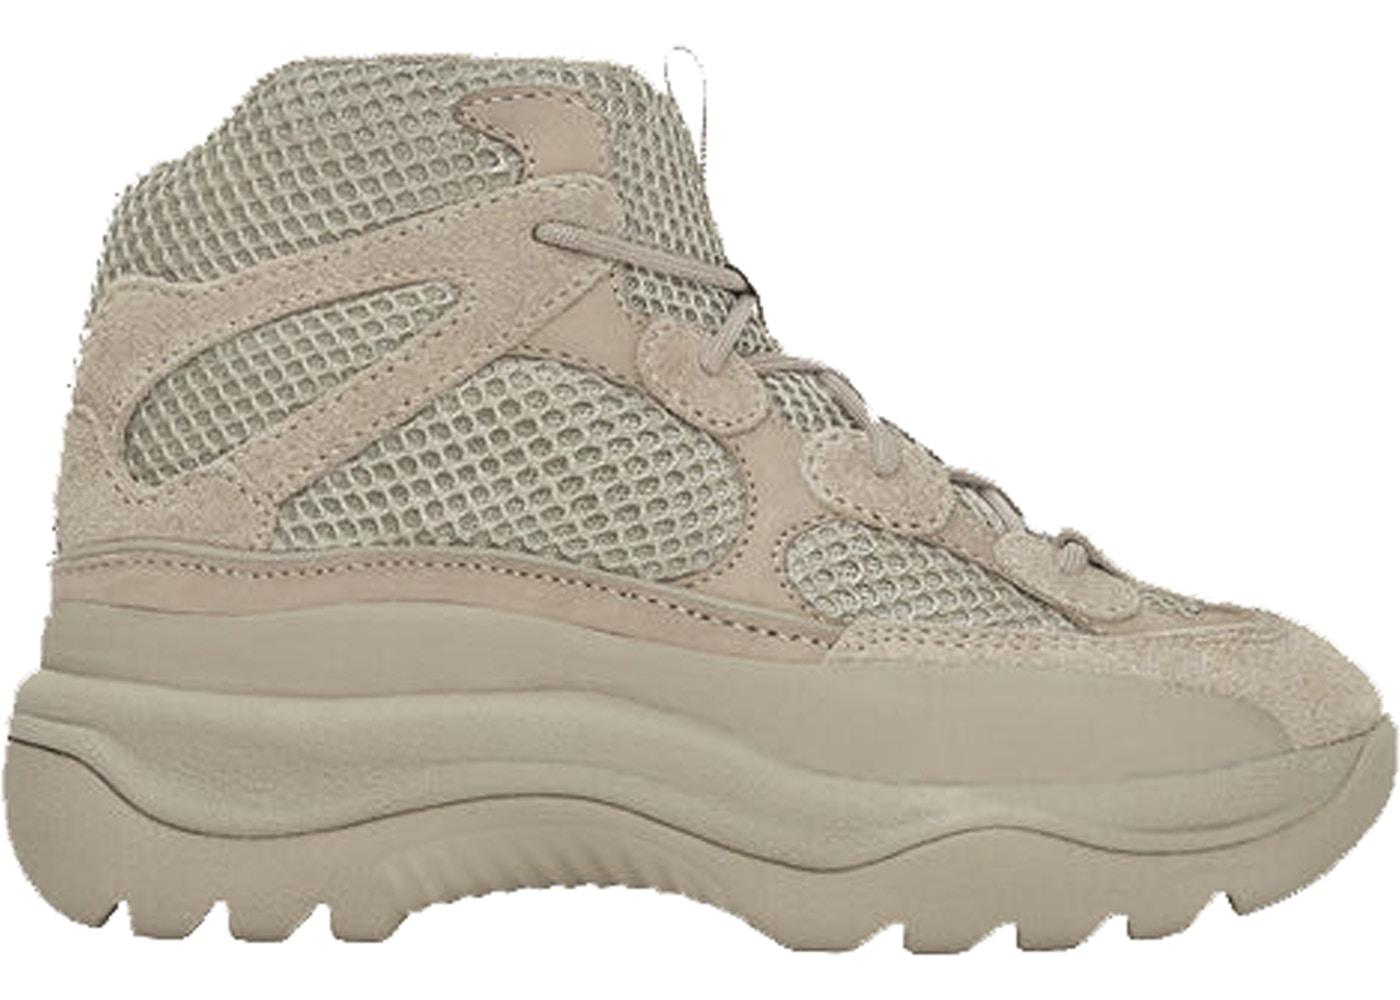 adidas Yeezy Desert Boot Rock (Kids)